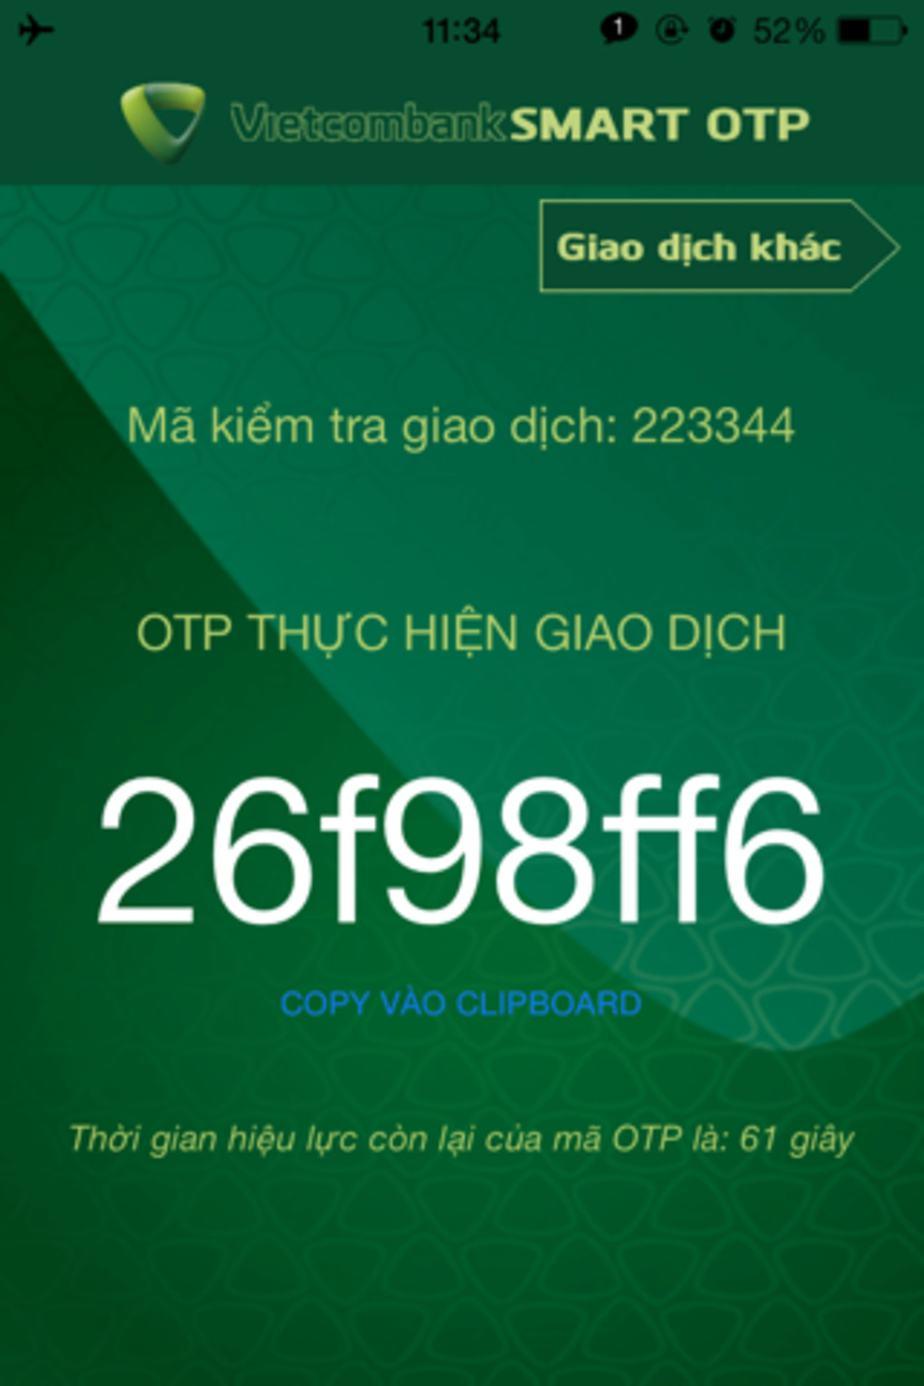 Mã giao dịch Smart OTP